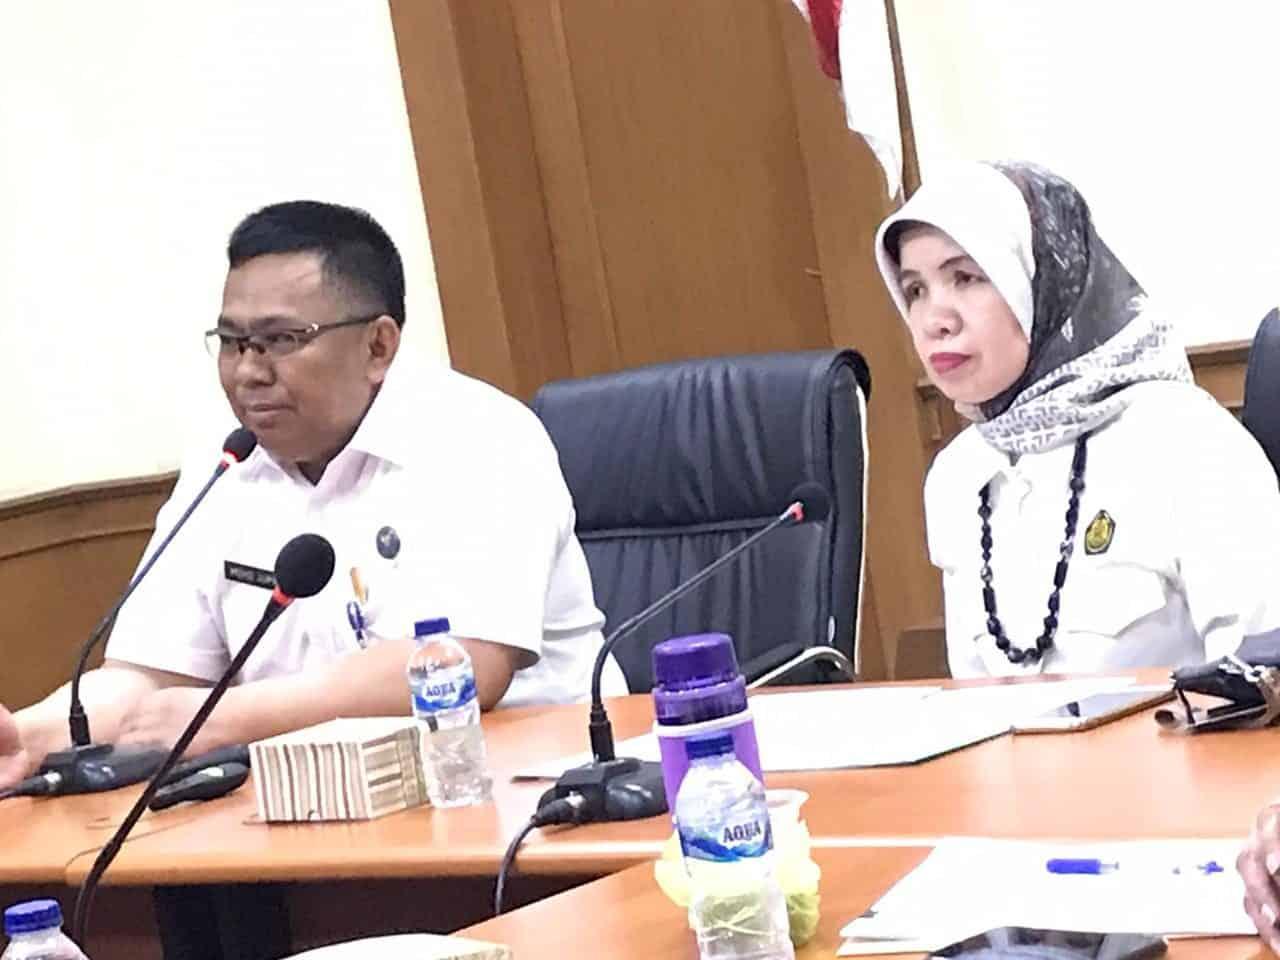 Kementerian ESDM Laksanakan Sosialisasi & Tes Urine Bagi Pegawai